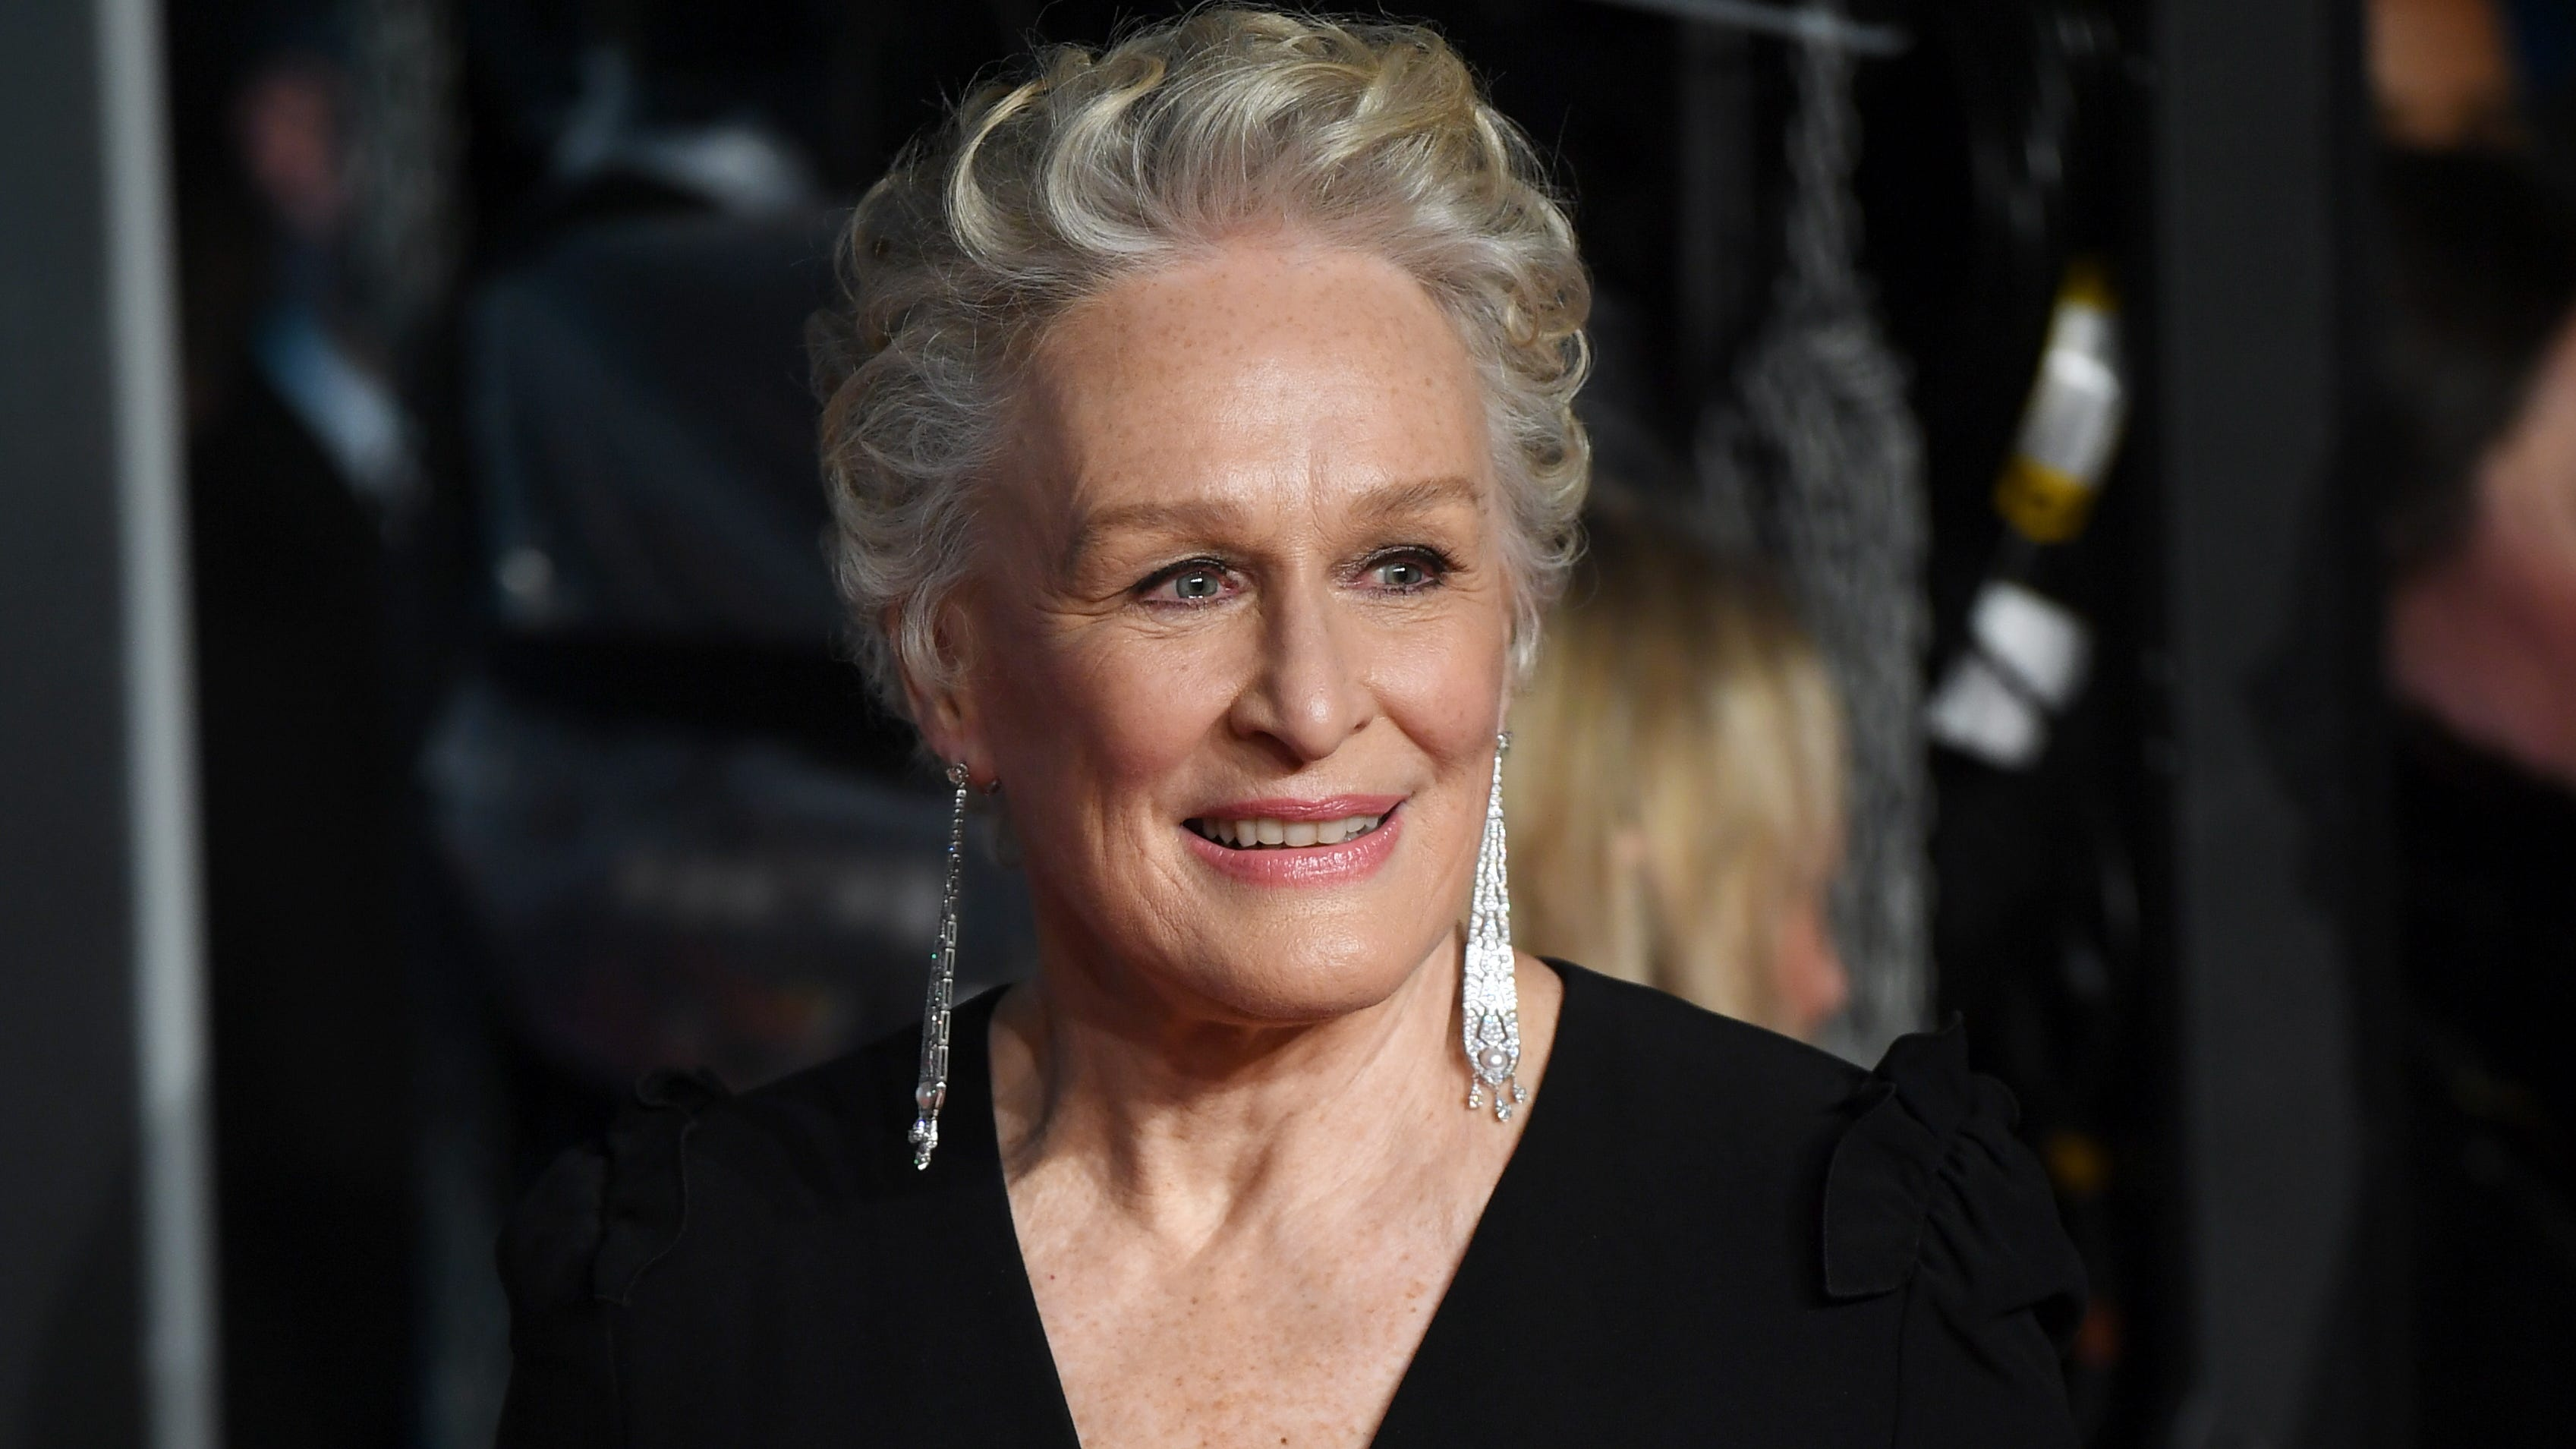 BAFTA 2019: BAFTA 2019: See Stars On The Red Carpet